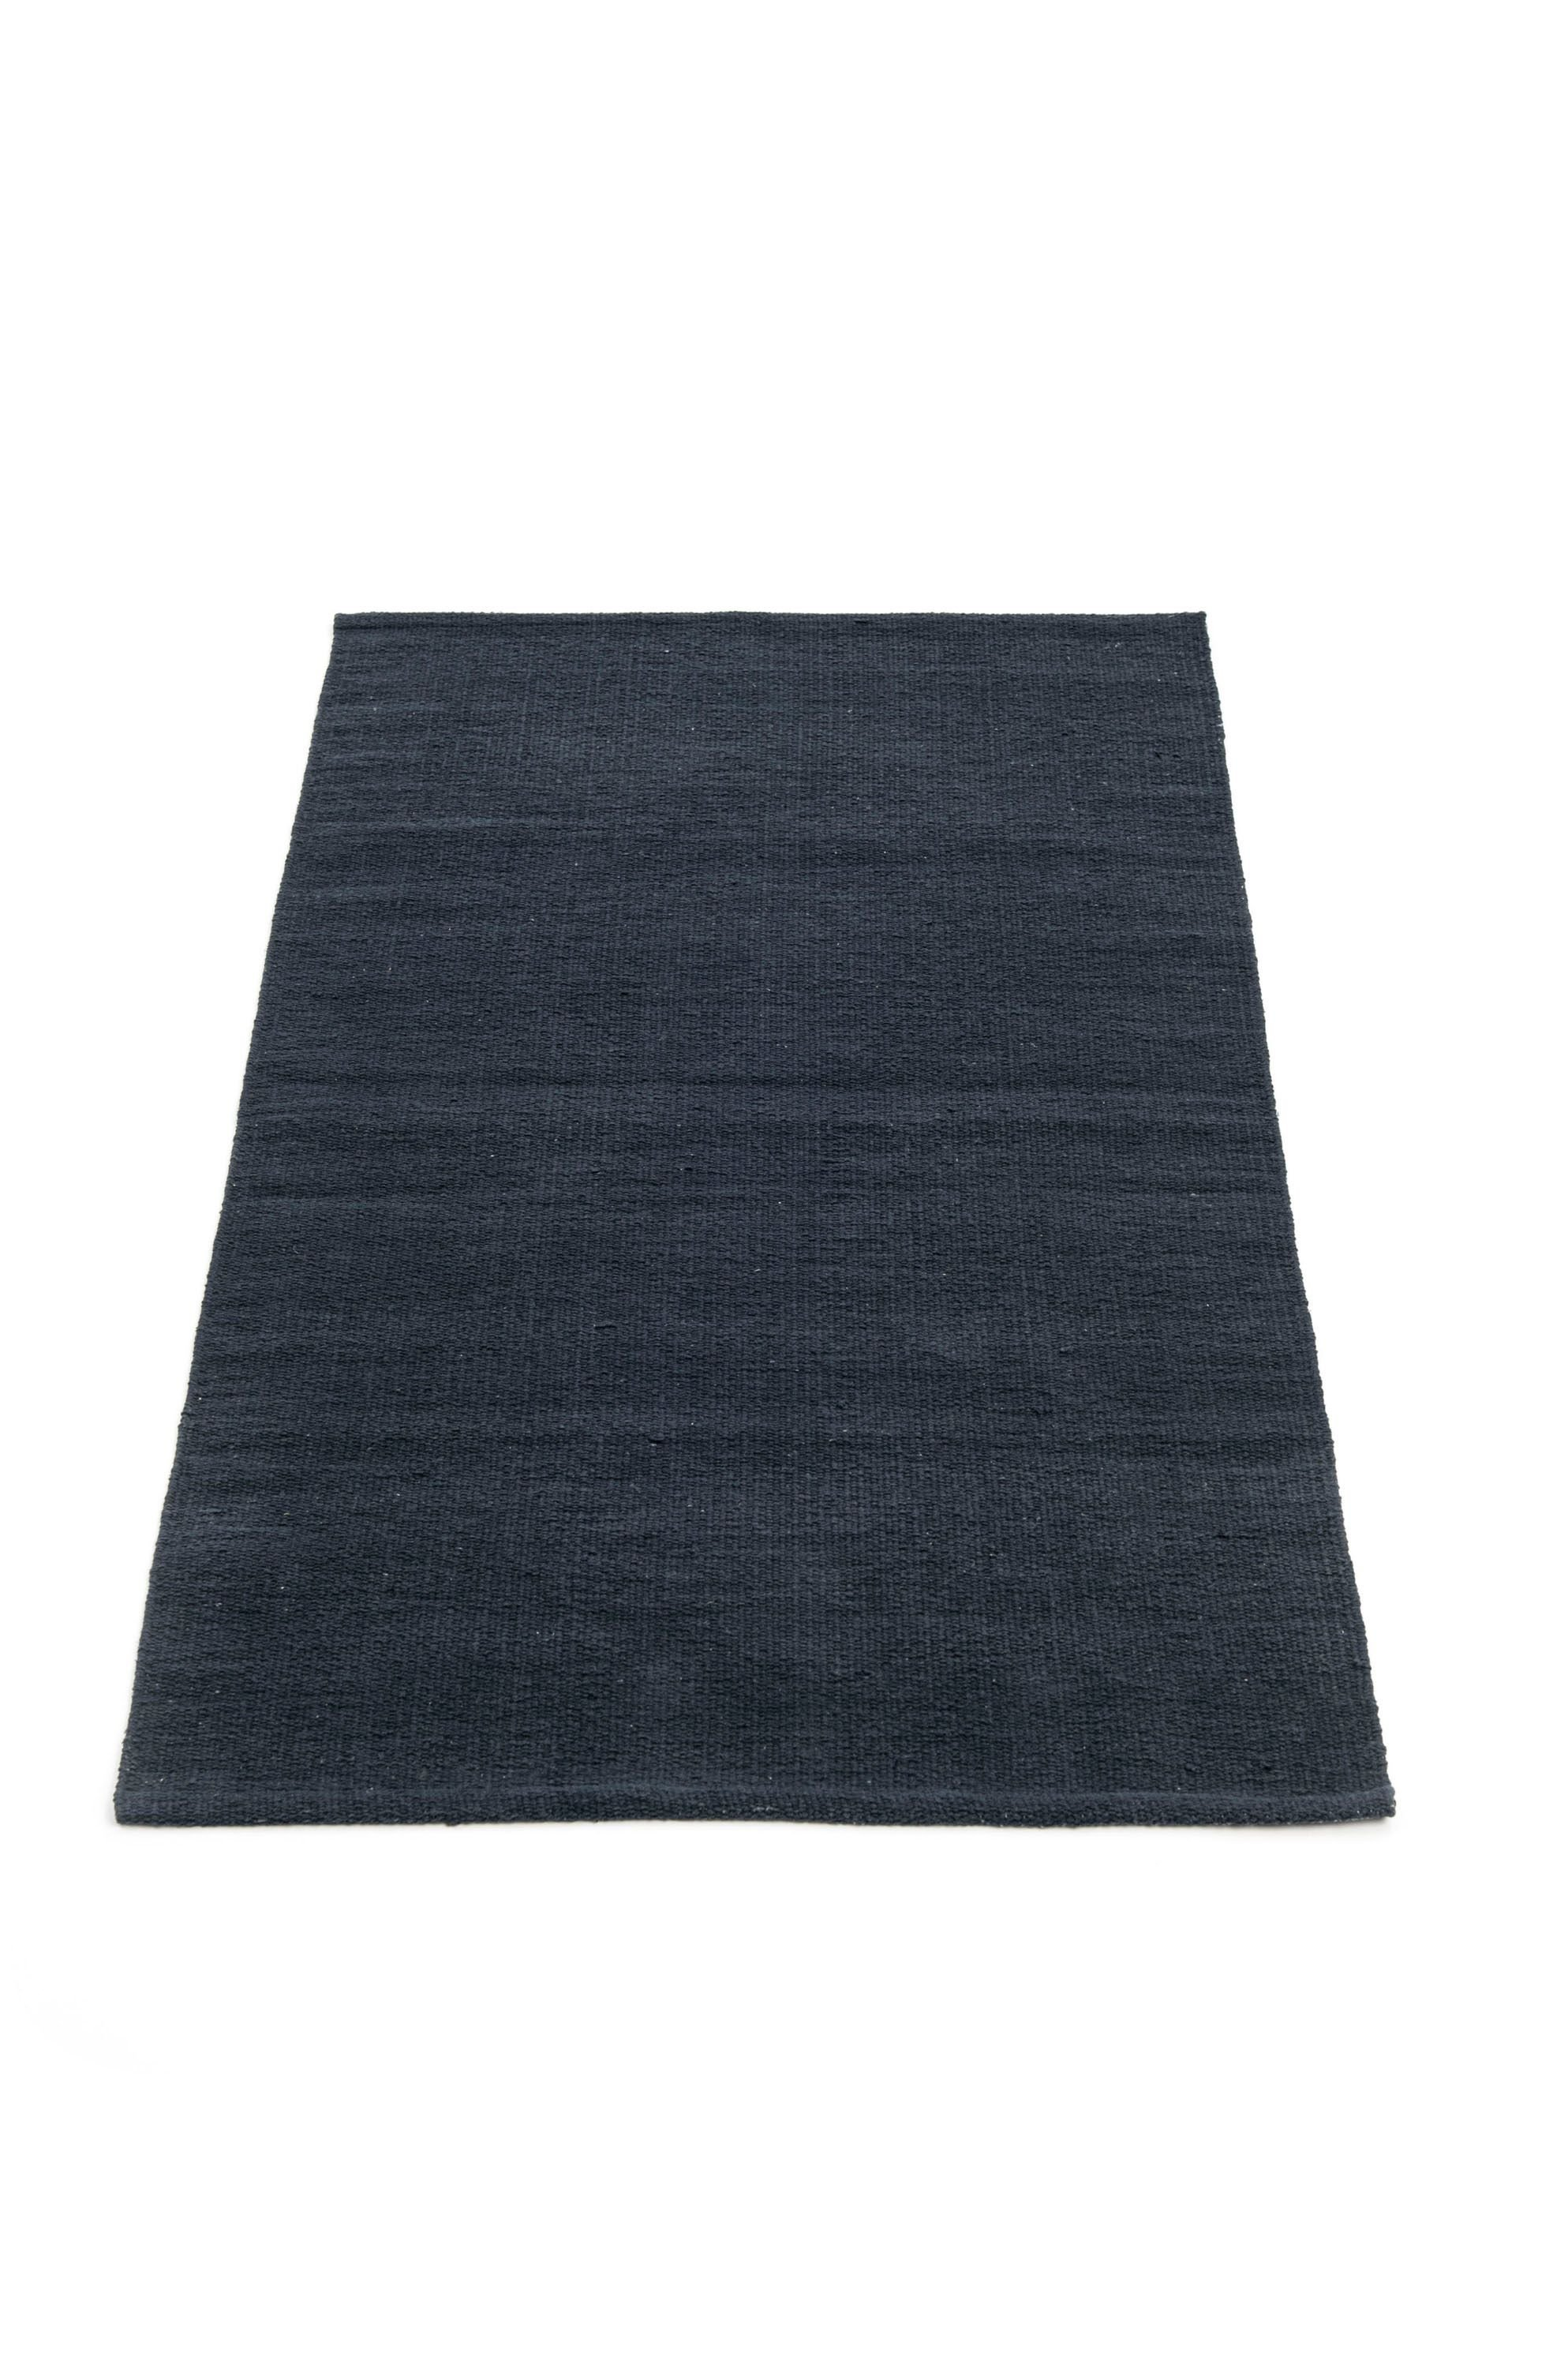 Smallstuff - Carpet Runner 70x125 cm - Navy